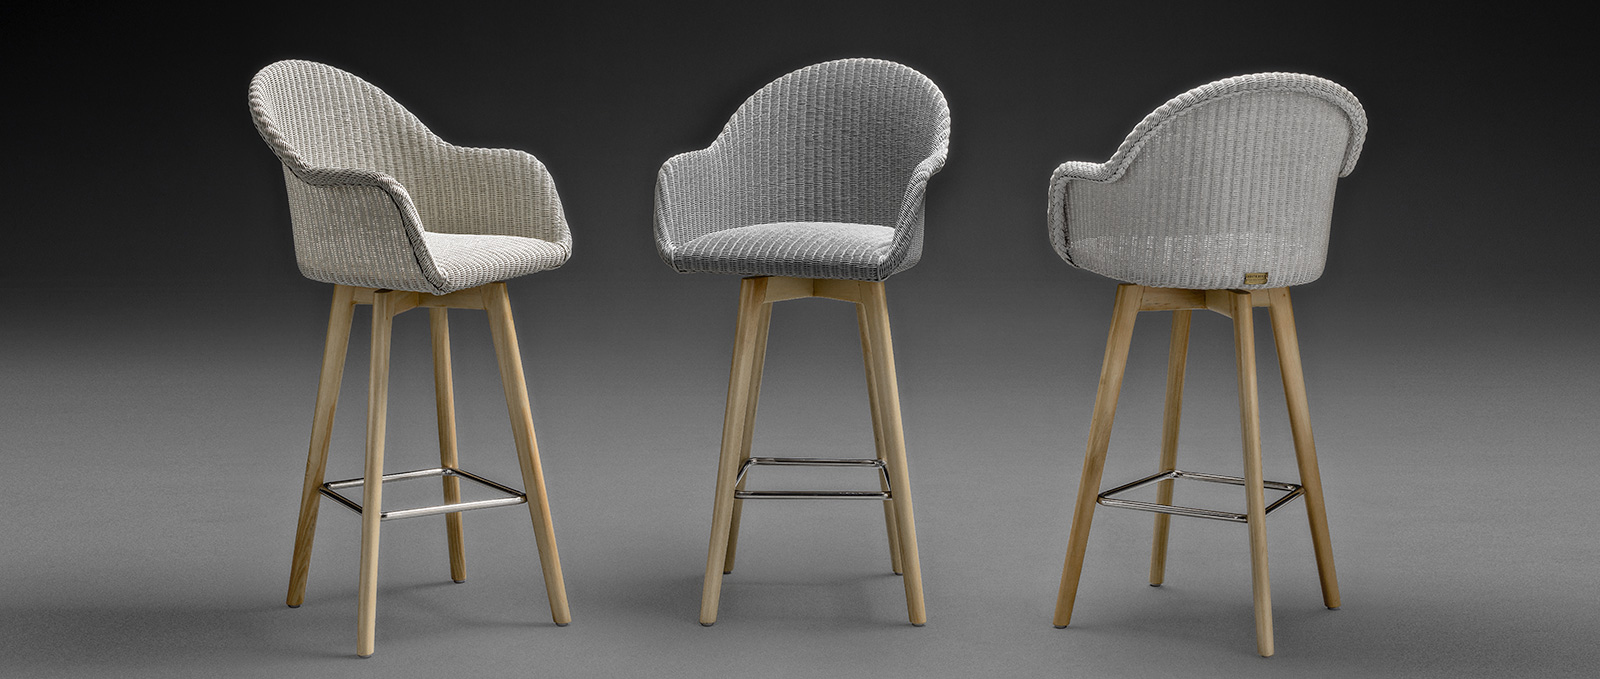 Lloyd Loom Bar Chairs - Carnaby Bar Stool Swivel Range